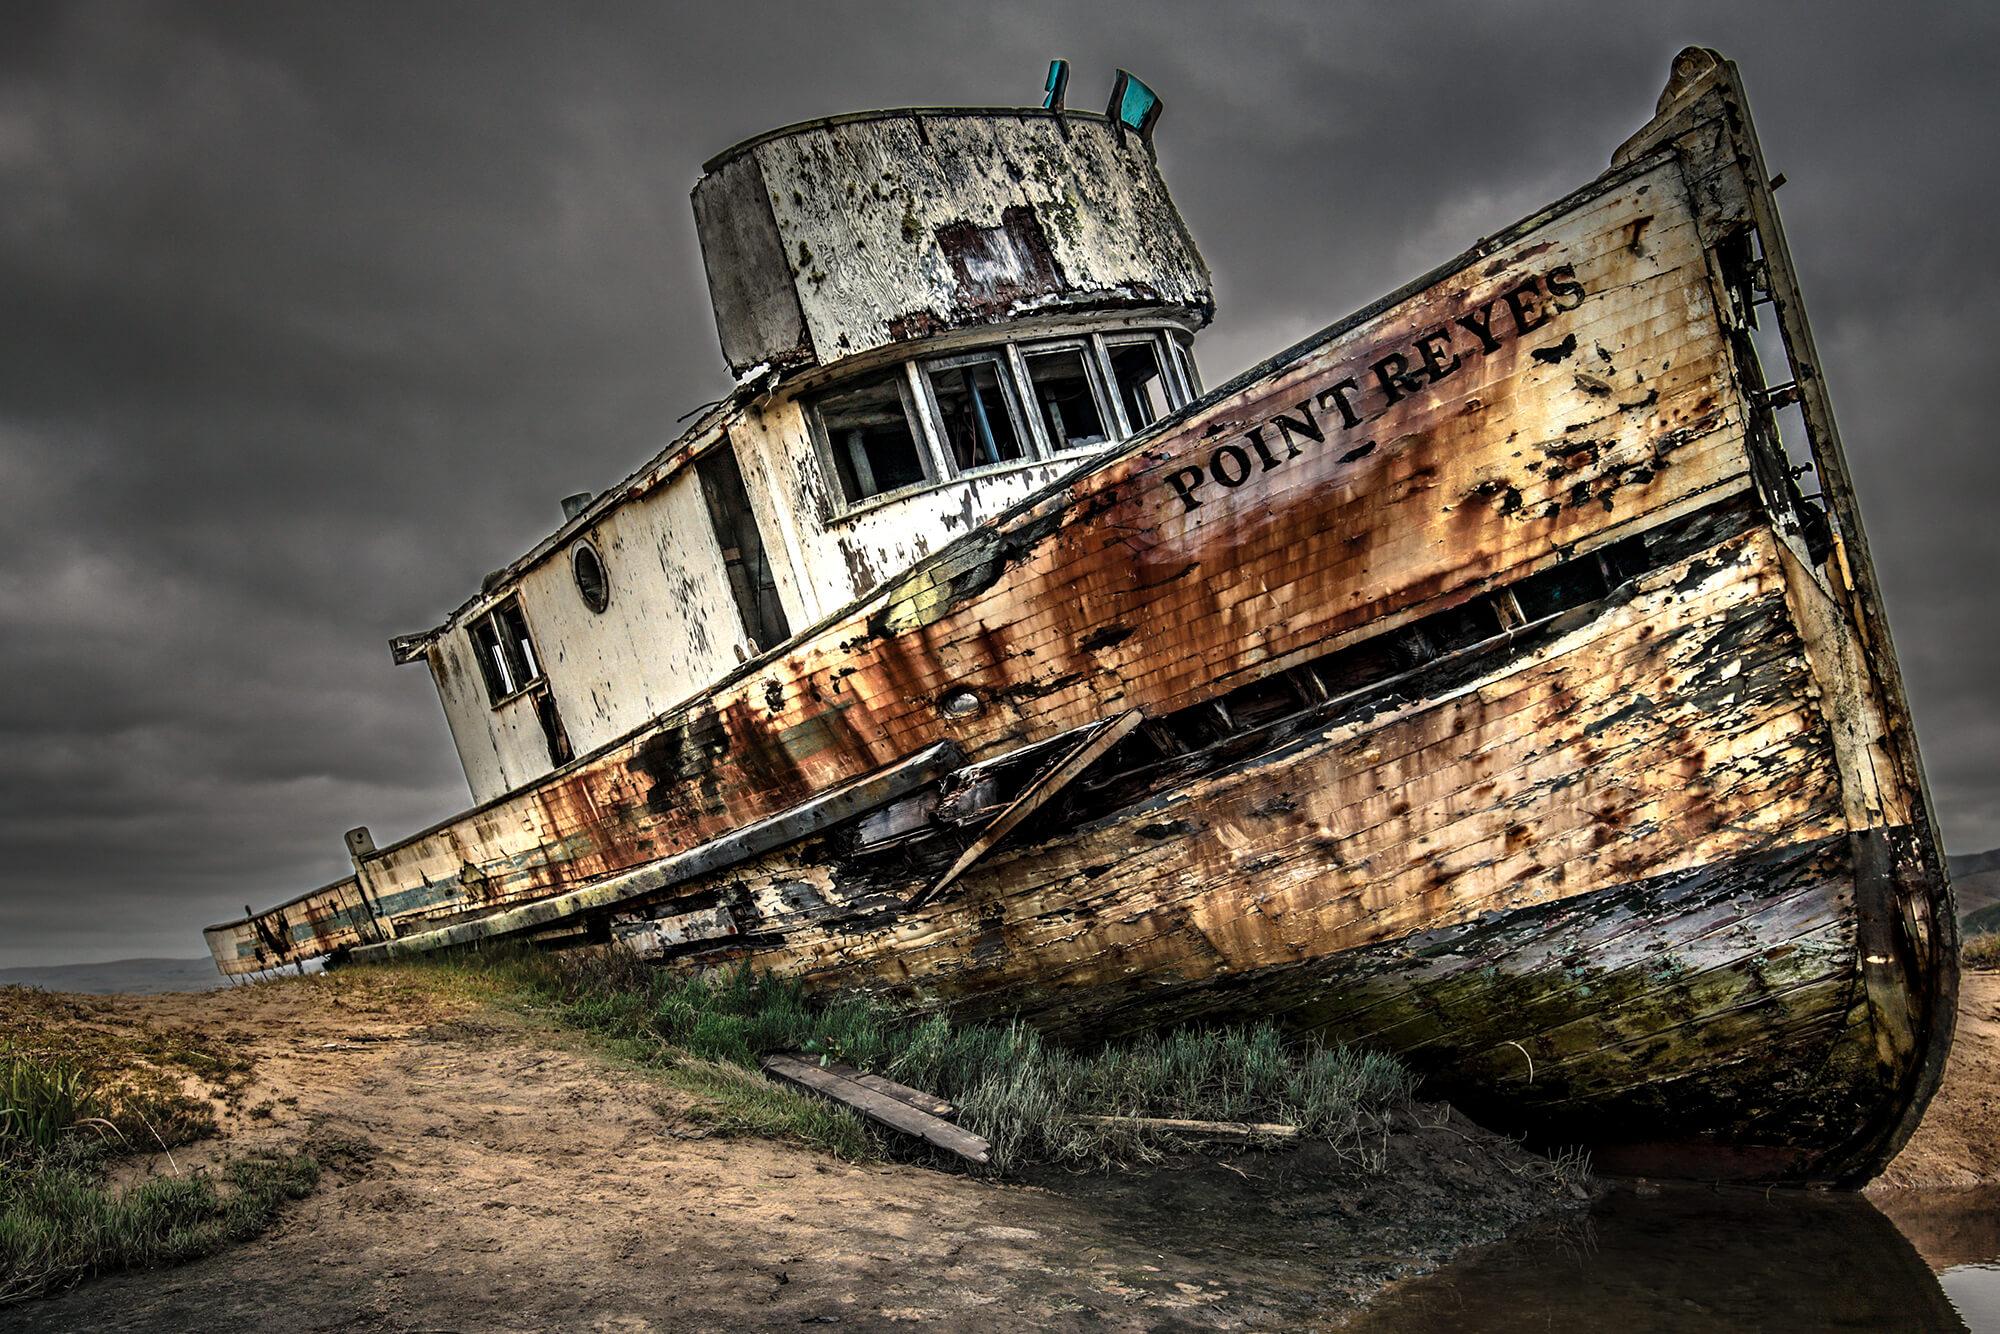 Point Reyes Shipwreck After Fire (Burned) Starboard Side